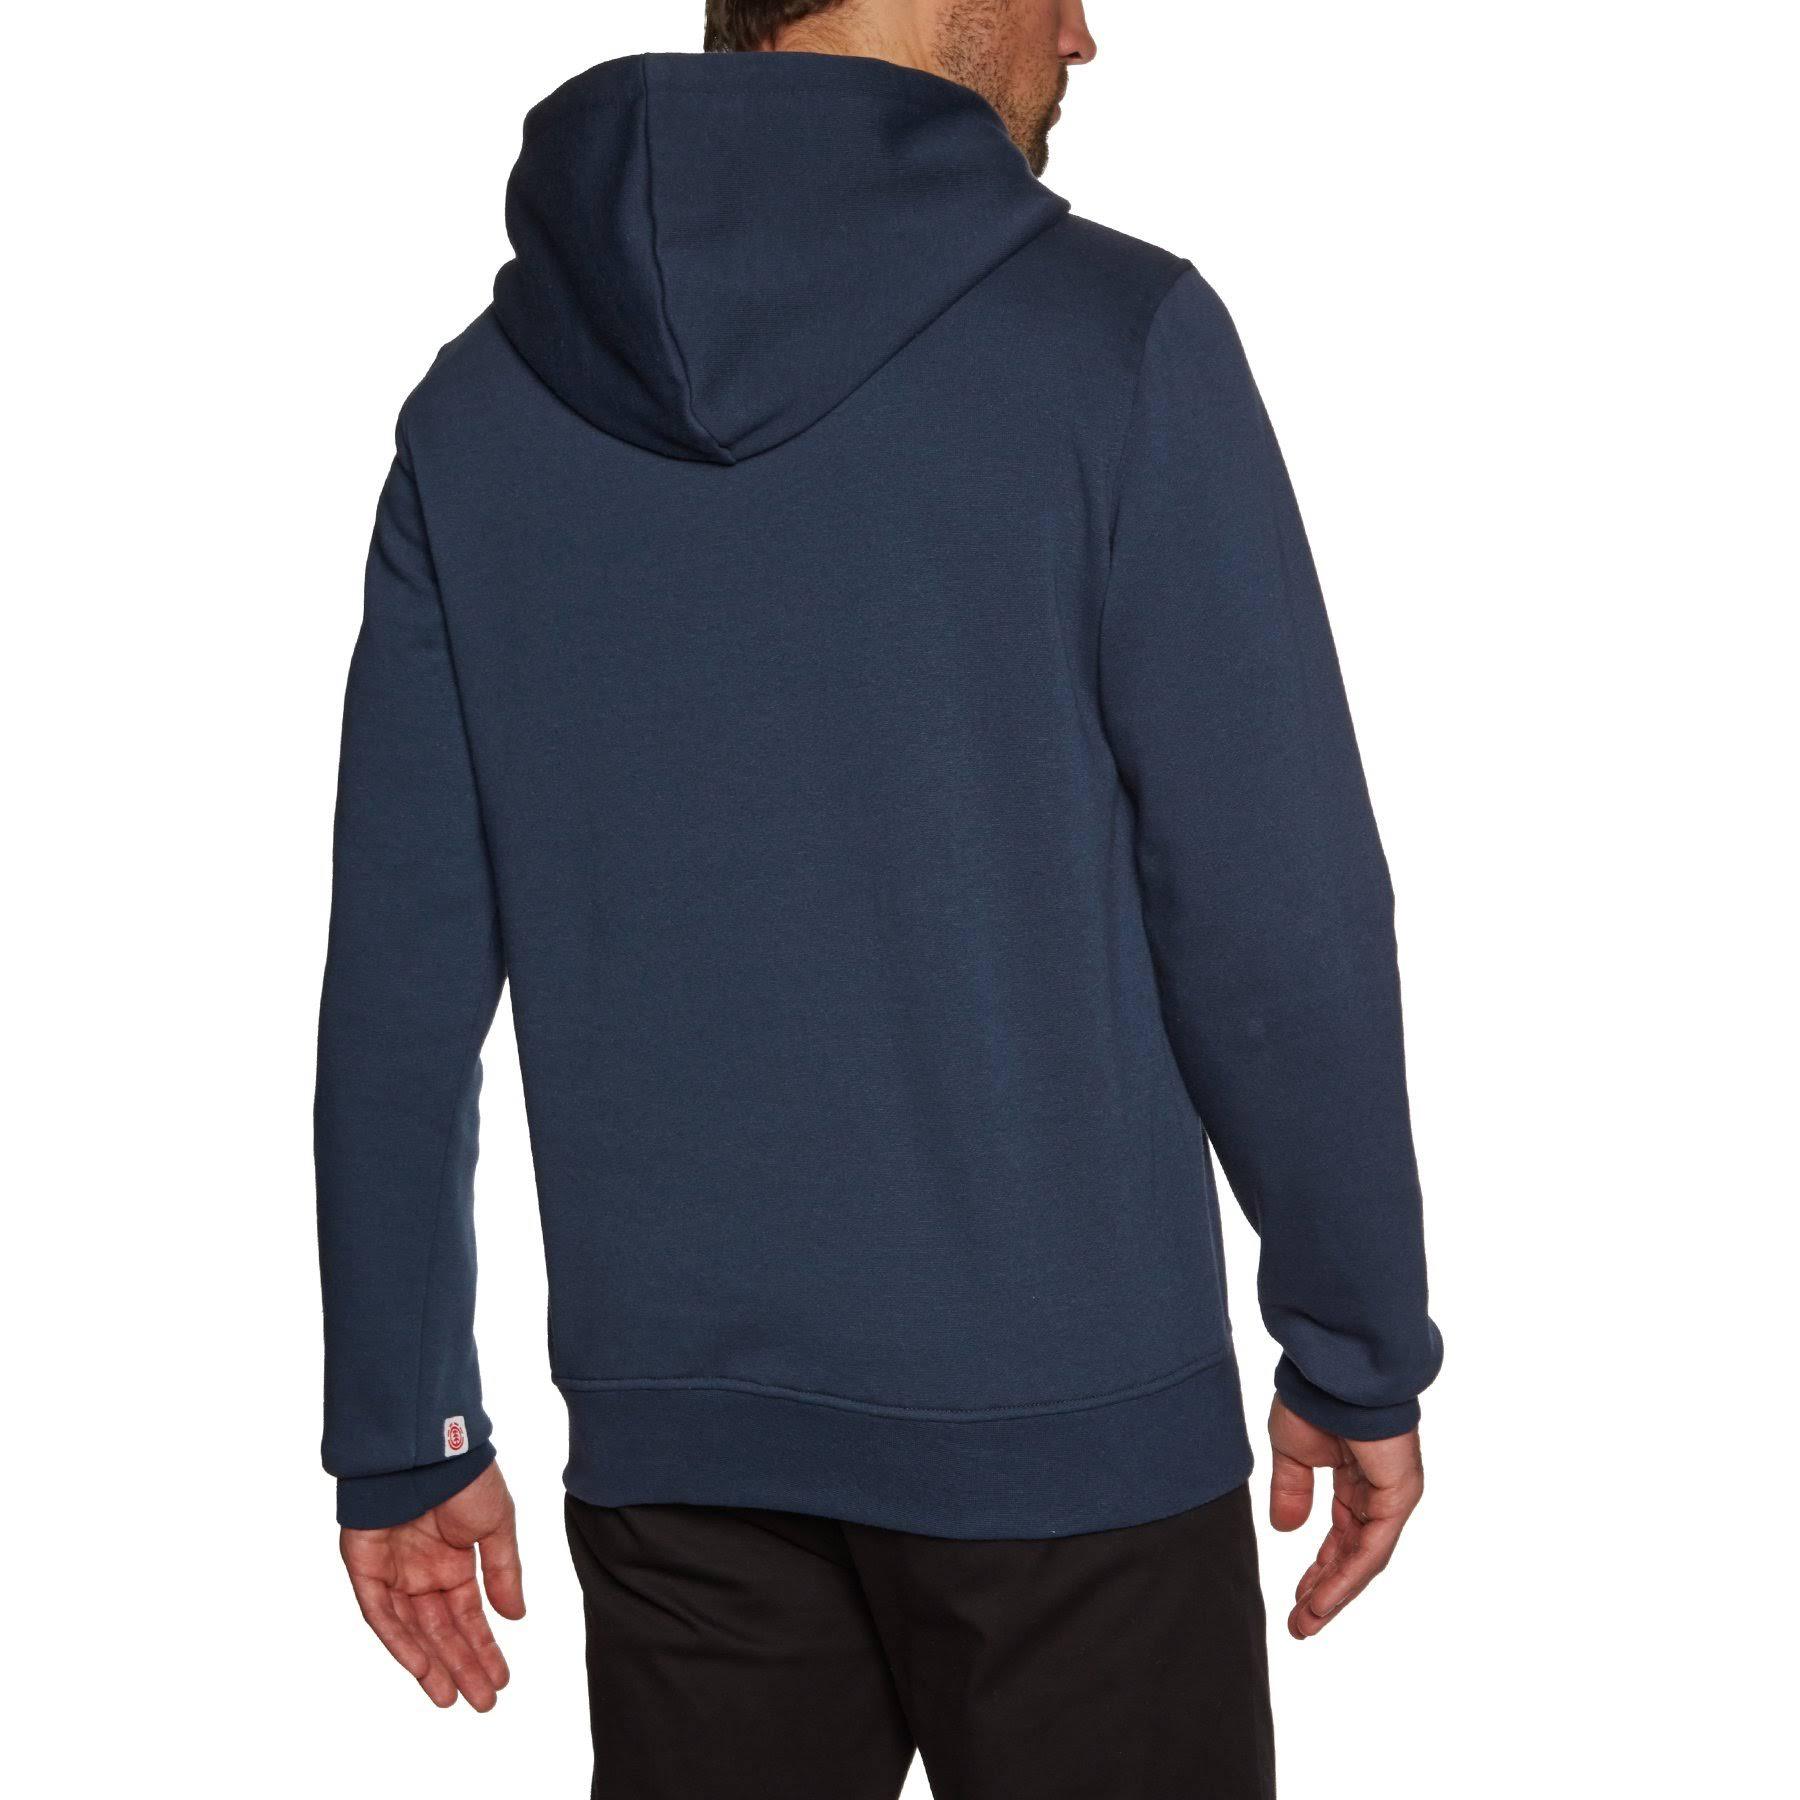 Xs Hood Vertical Elemento Elemento Blue SVUpqMz